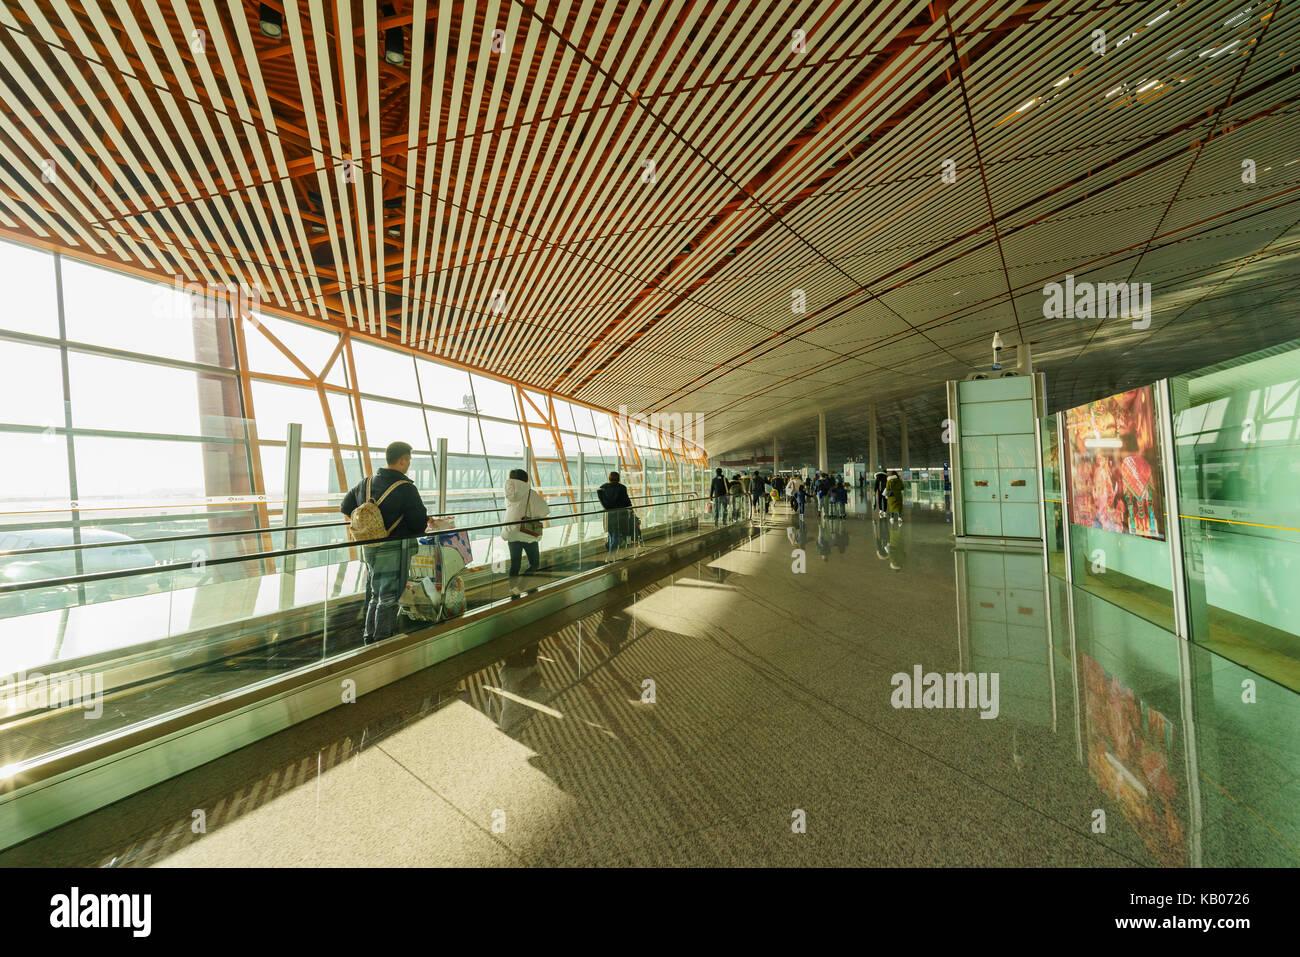 Beijing, JAN 3: Interior view of the Escalator of Beijing International Airport at Beijing, China - Stock Image